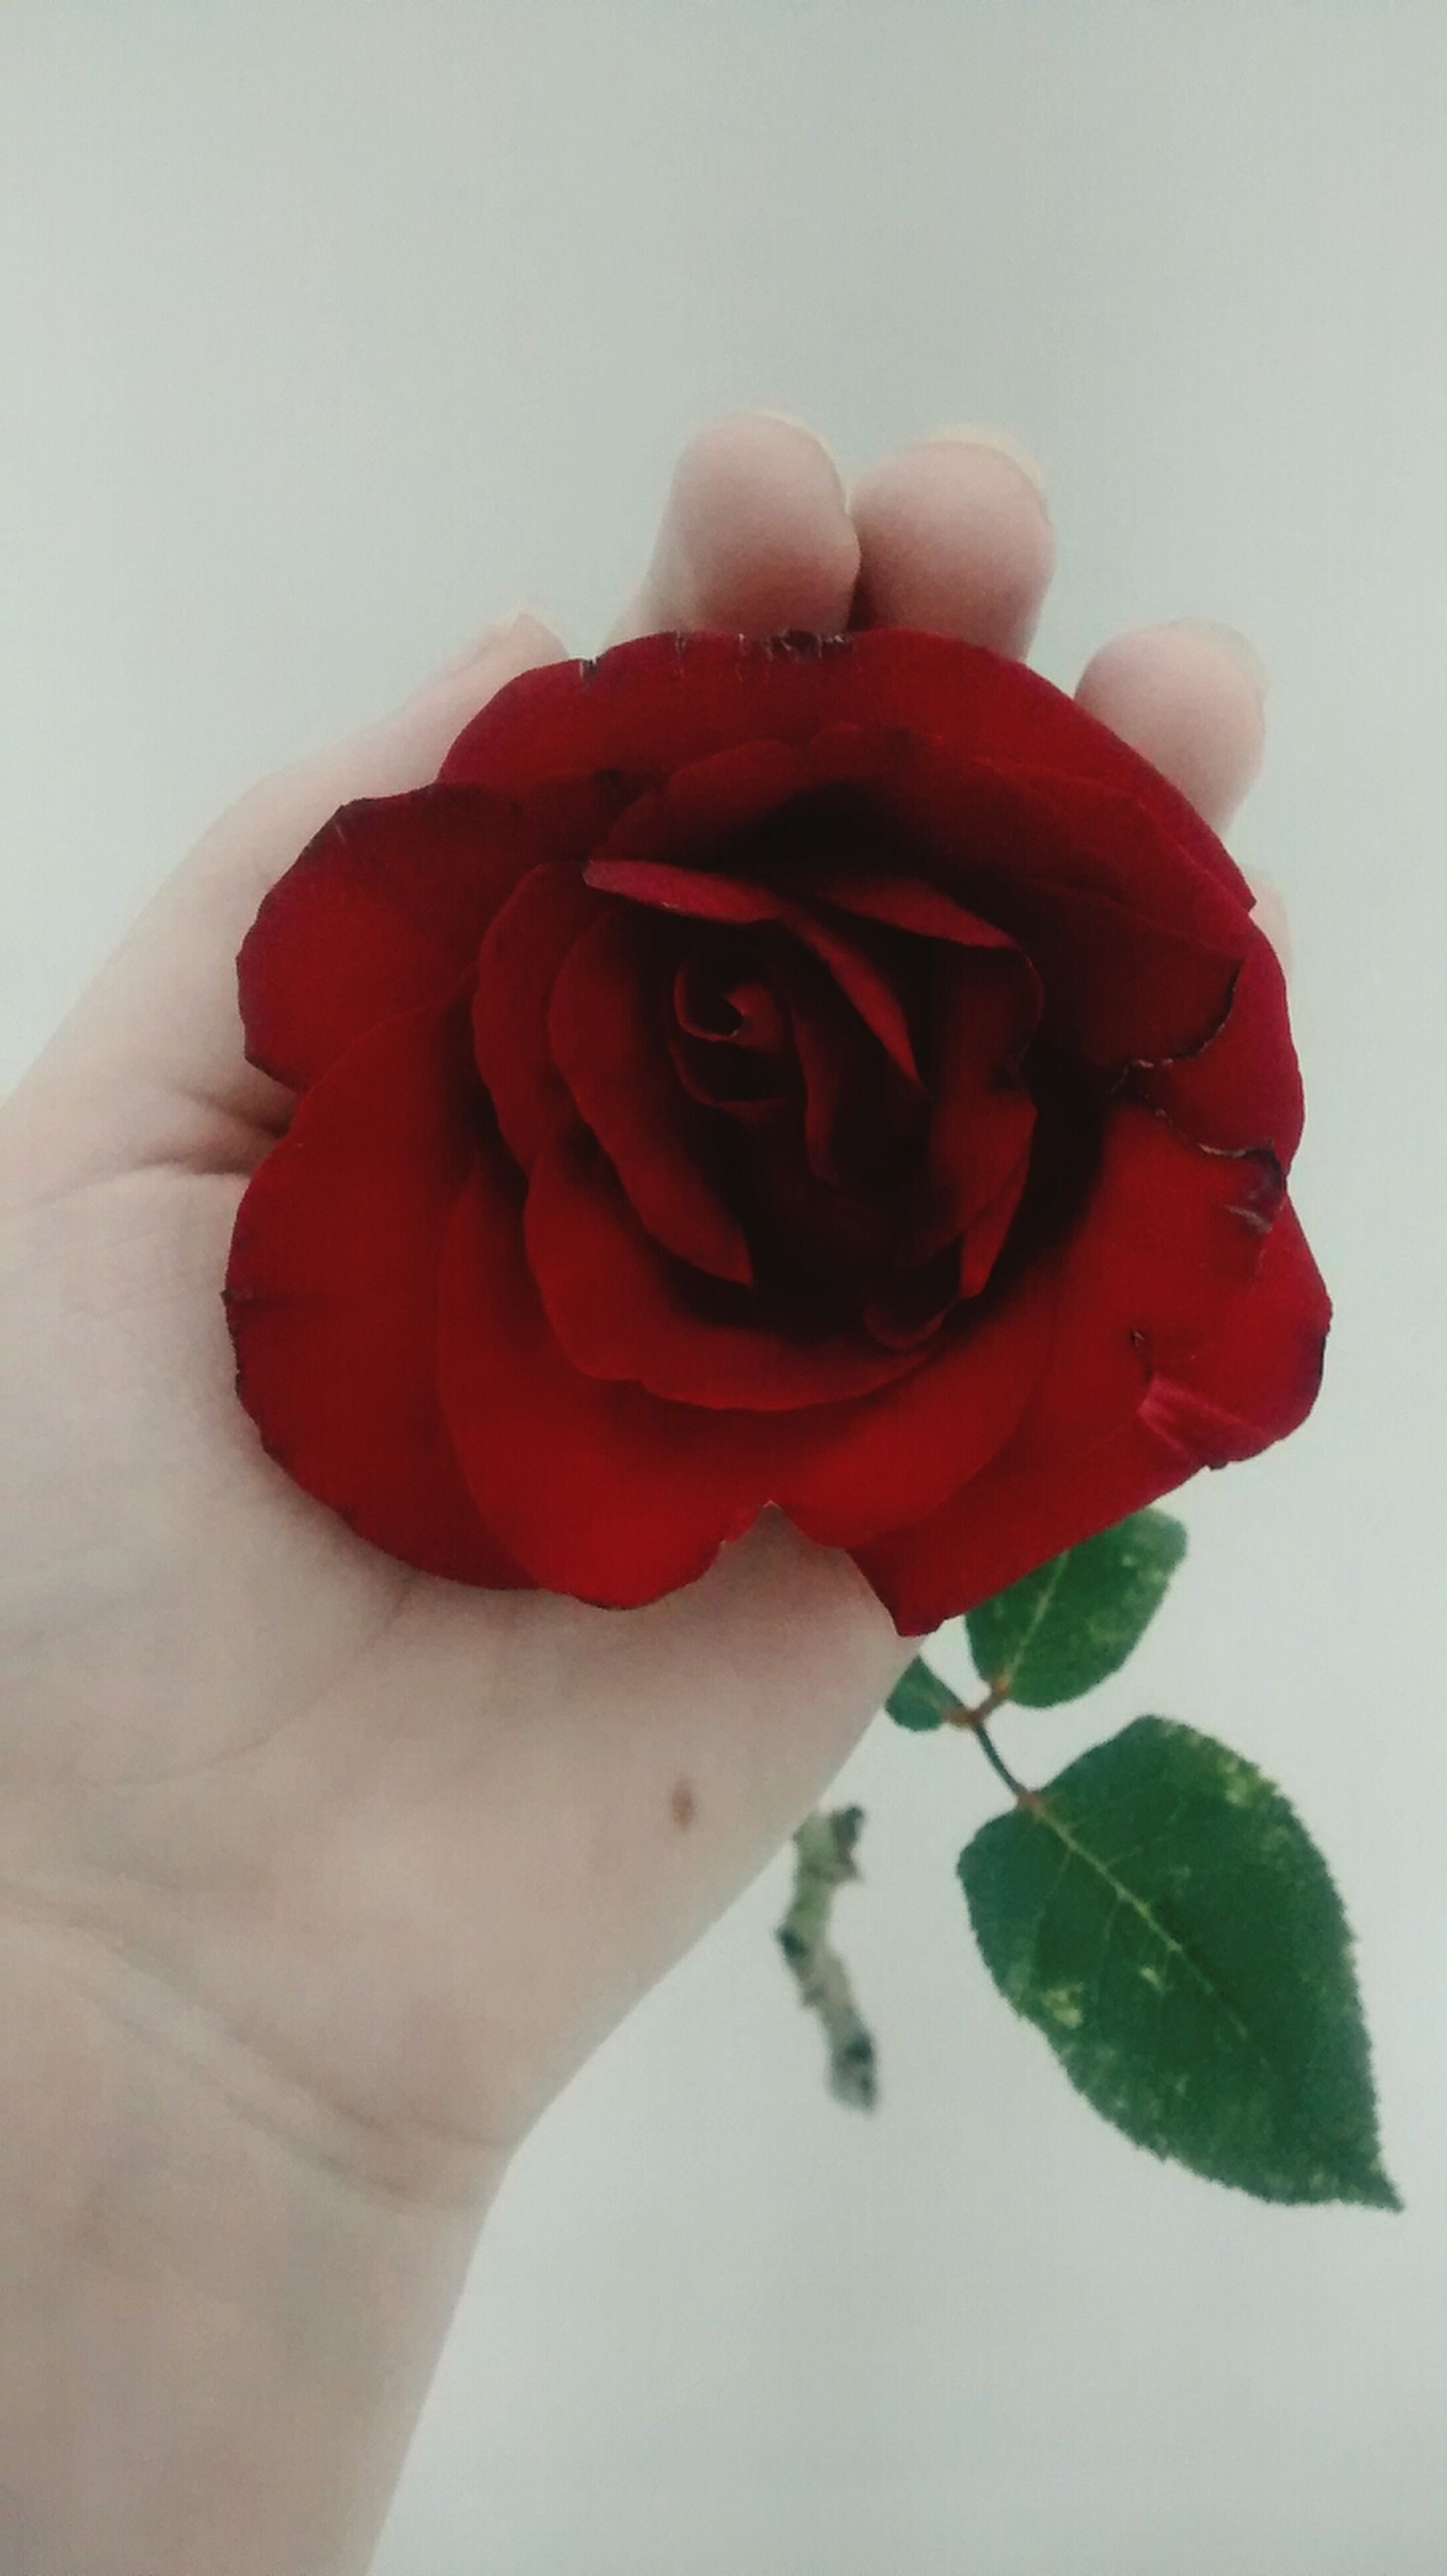 person, flower, petal, red, holding, flower head, freshness, studio shot, fragility, white background, rose - flower, part of, close-up, cropped, human finger, single flower, indoors